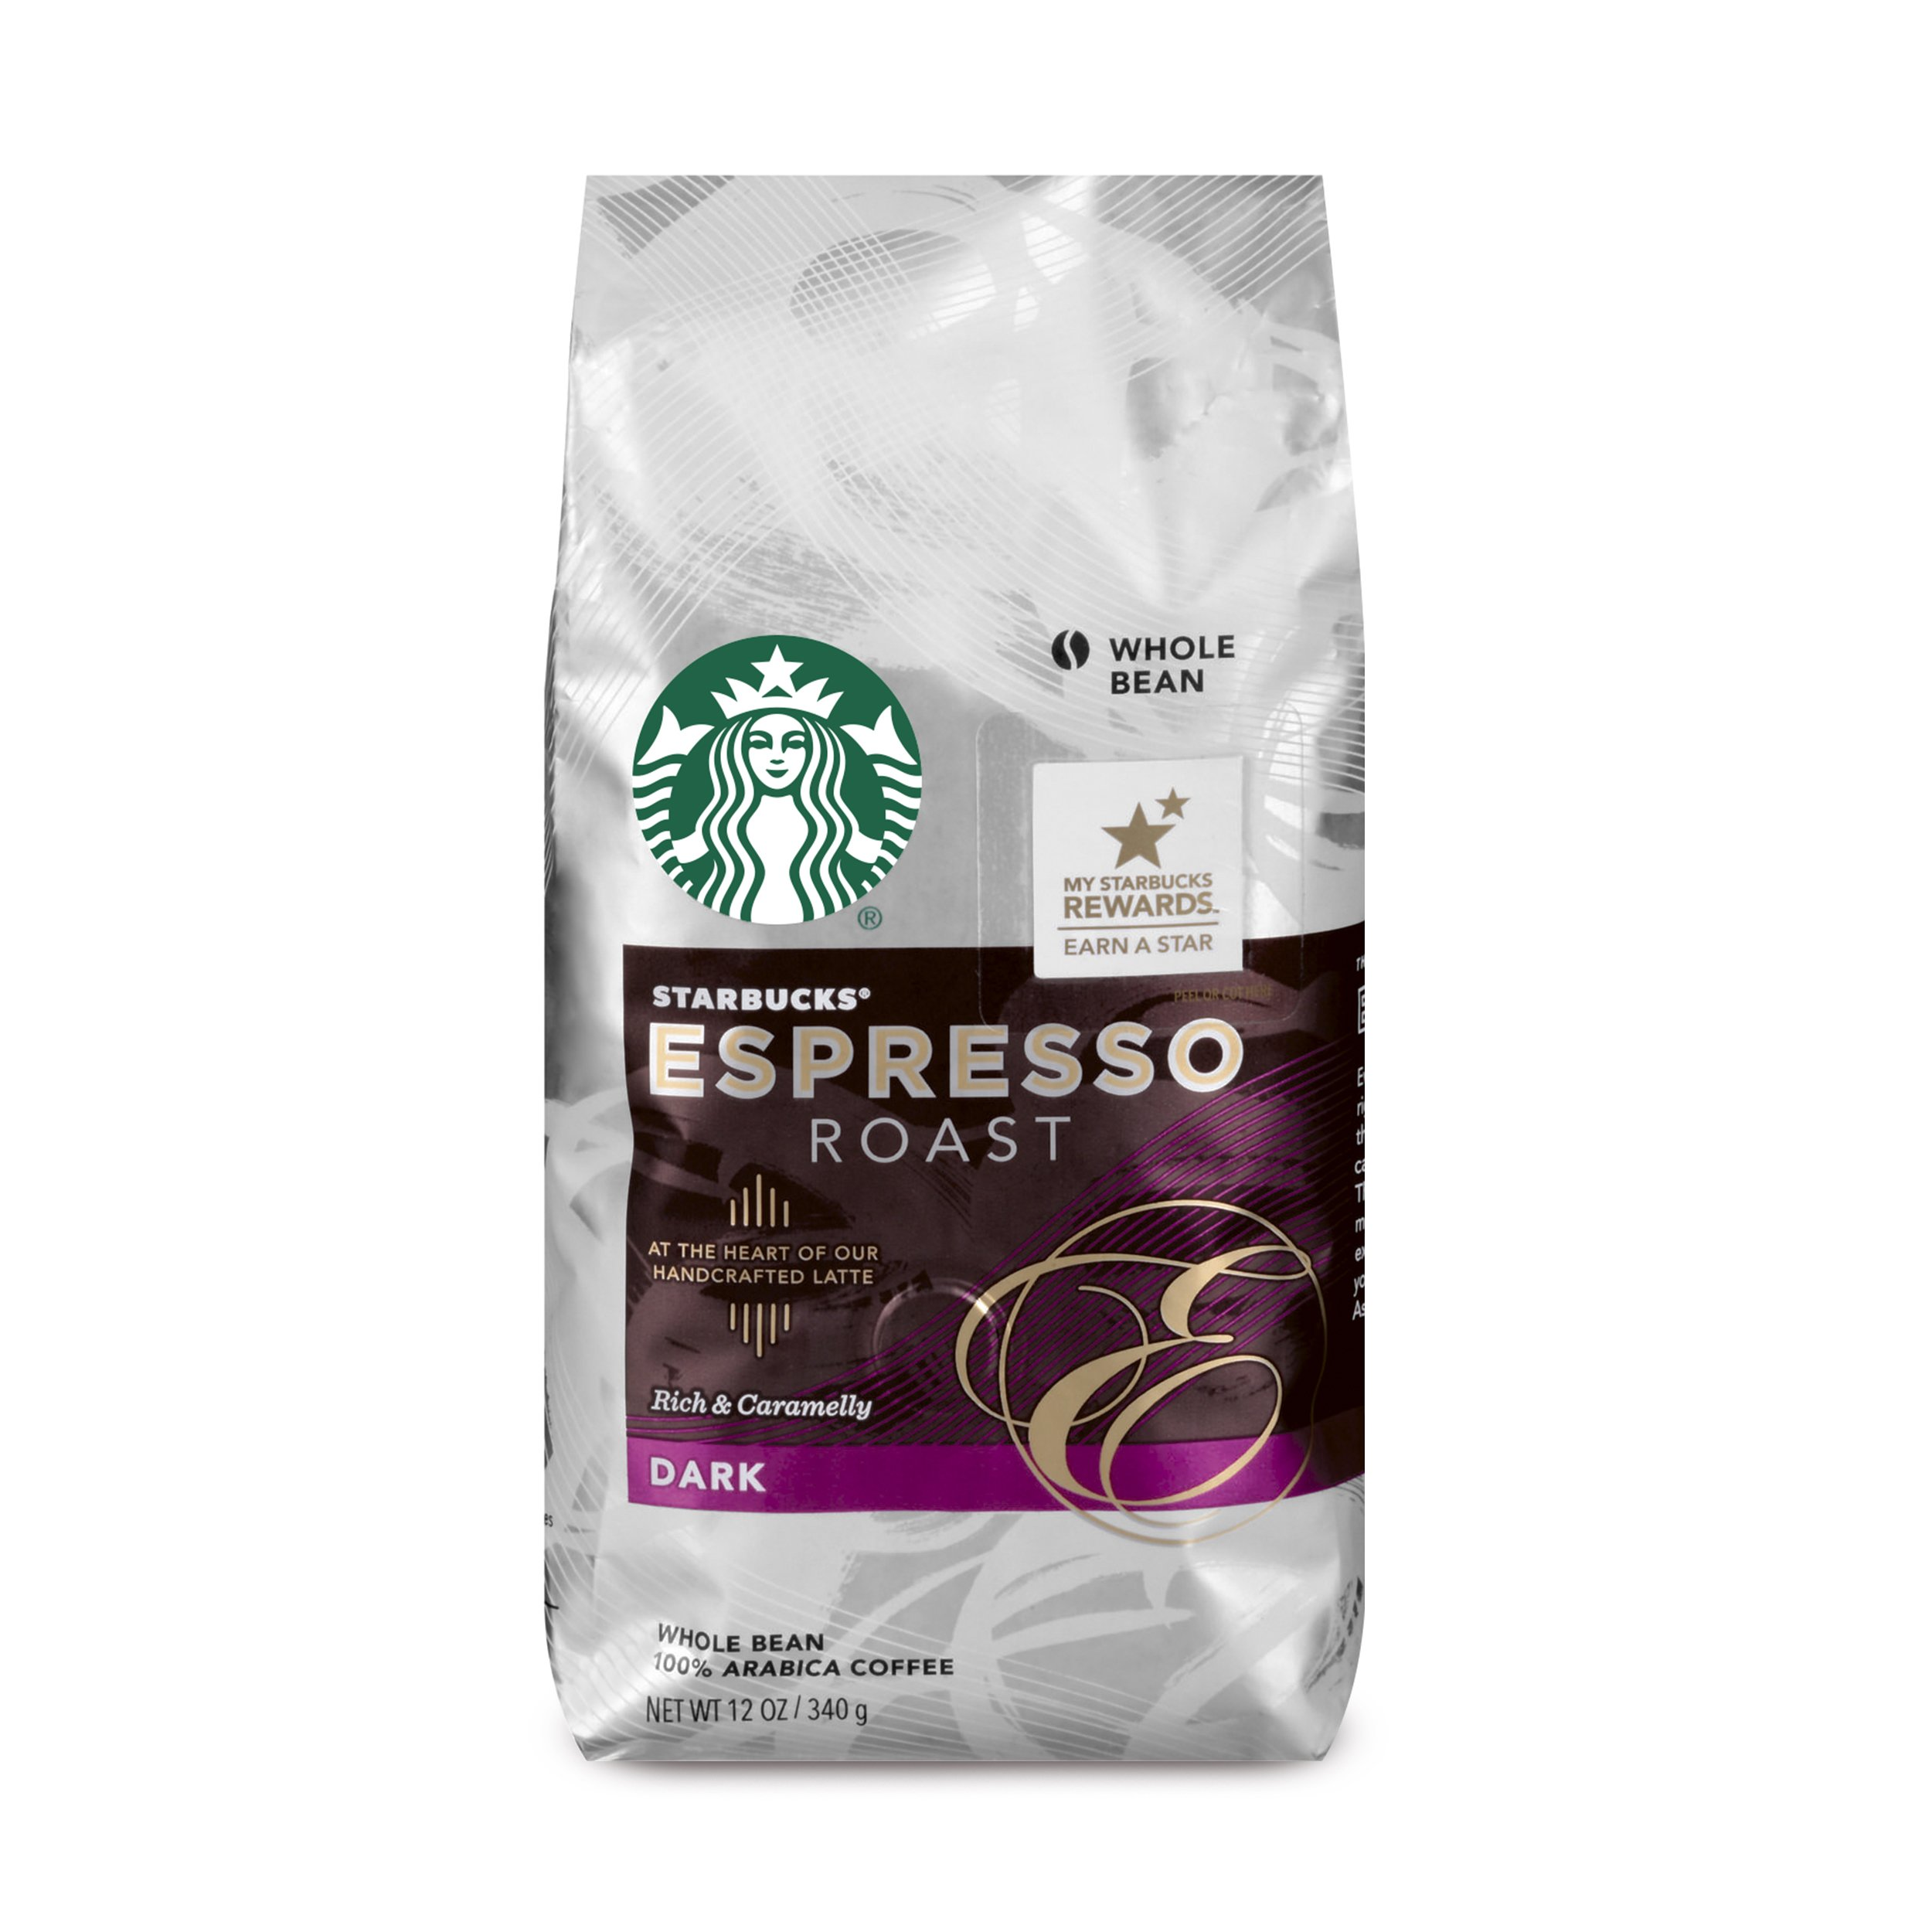 Espresso Roast Coffee ~ Amazon starbucks french roast whole bean coffee